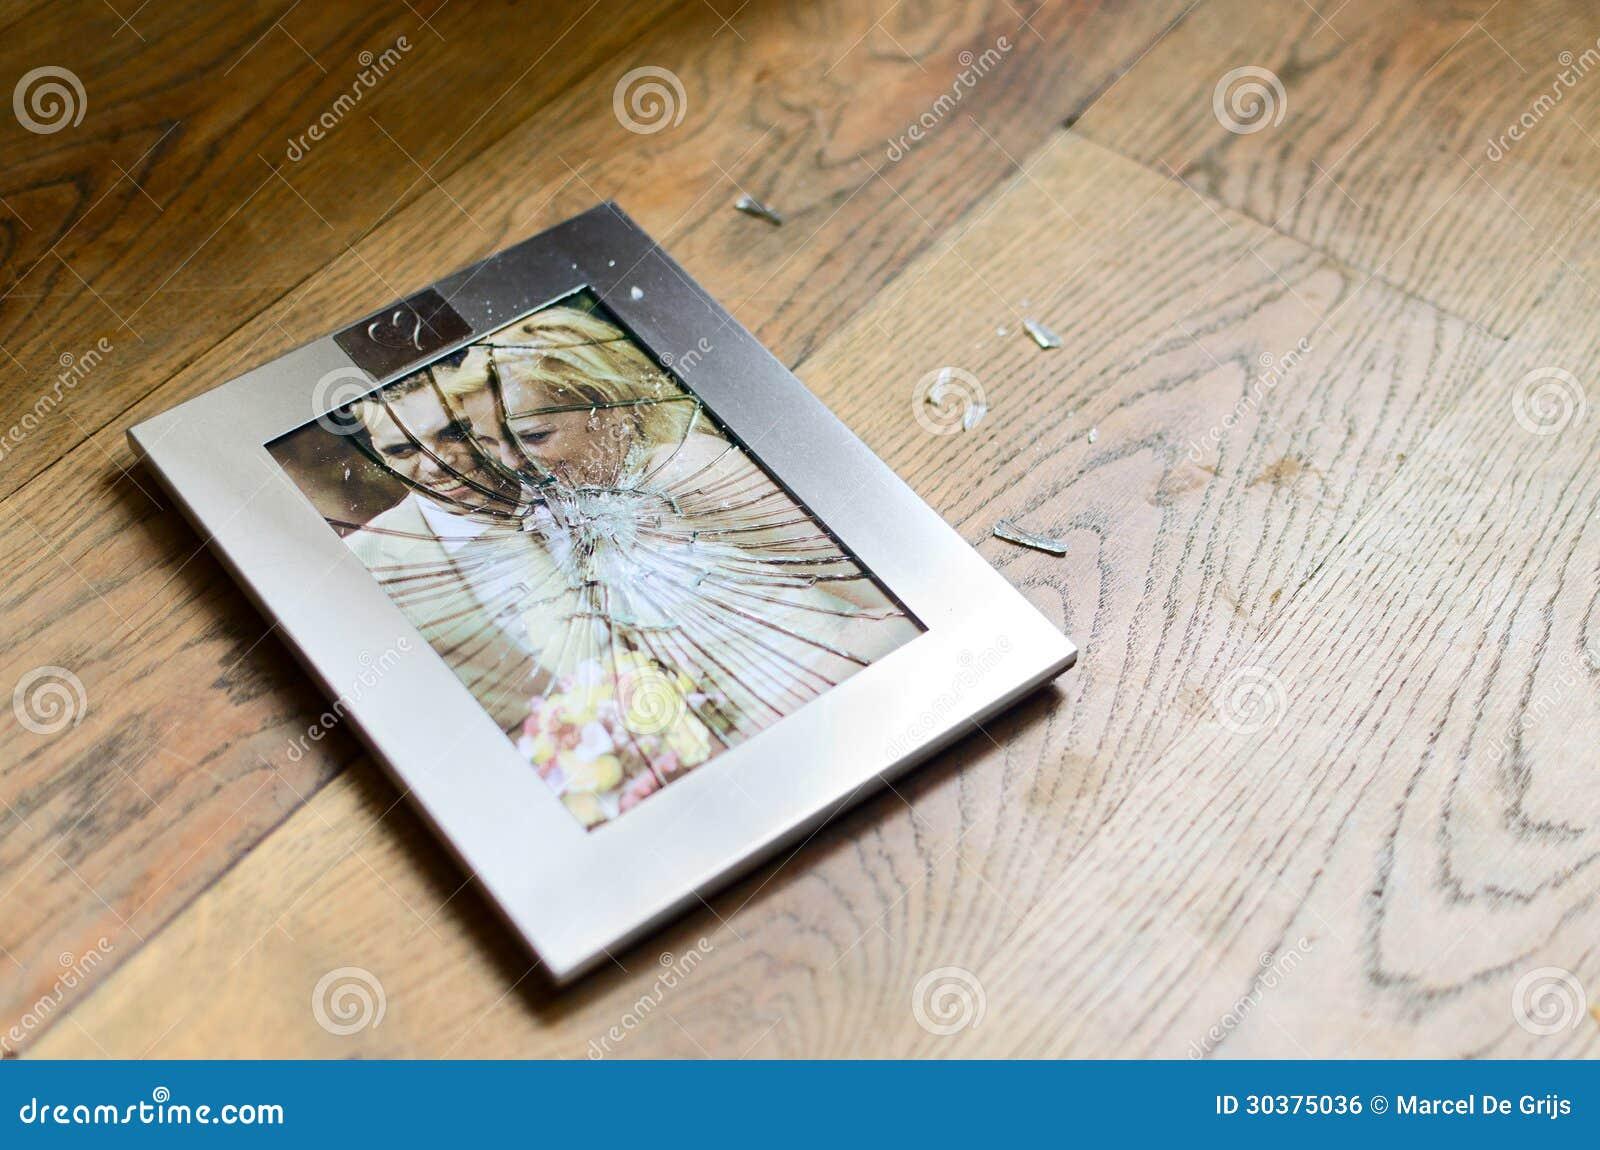 Broken Marriage Photo Frame Divorce Stock Photo Image Of